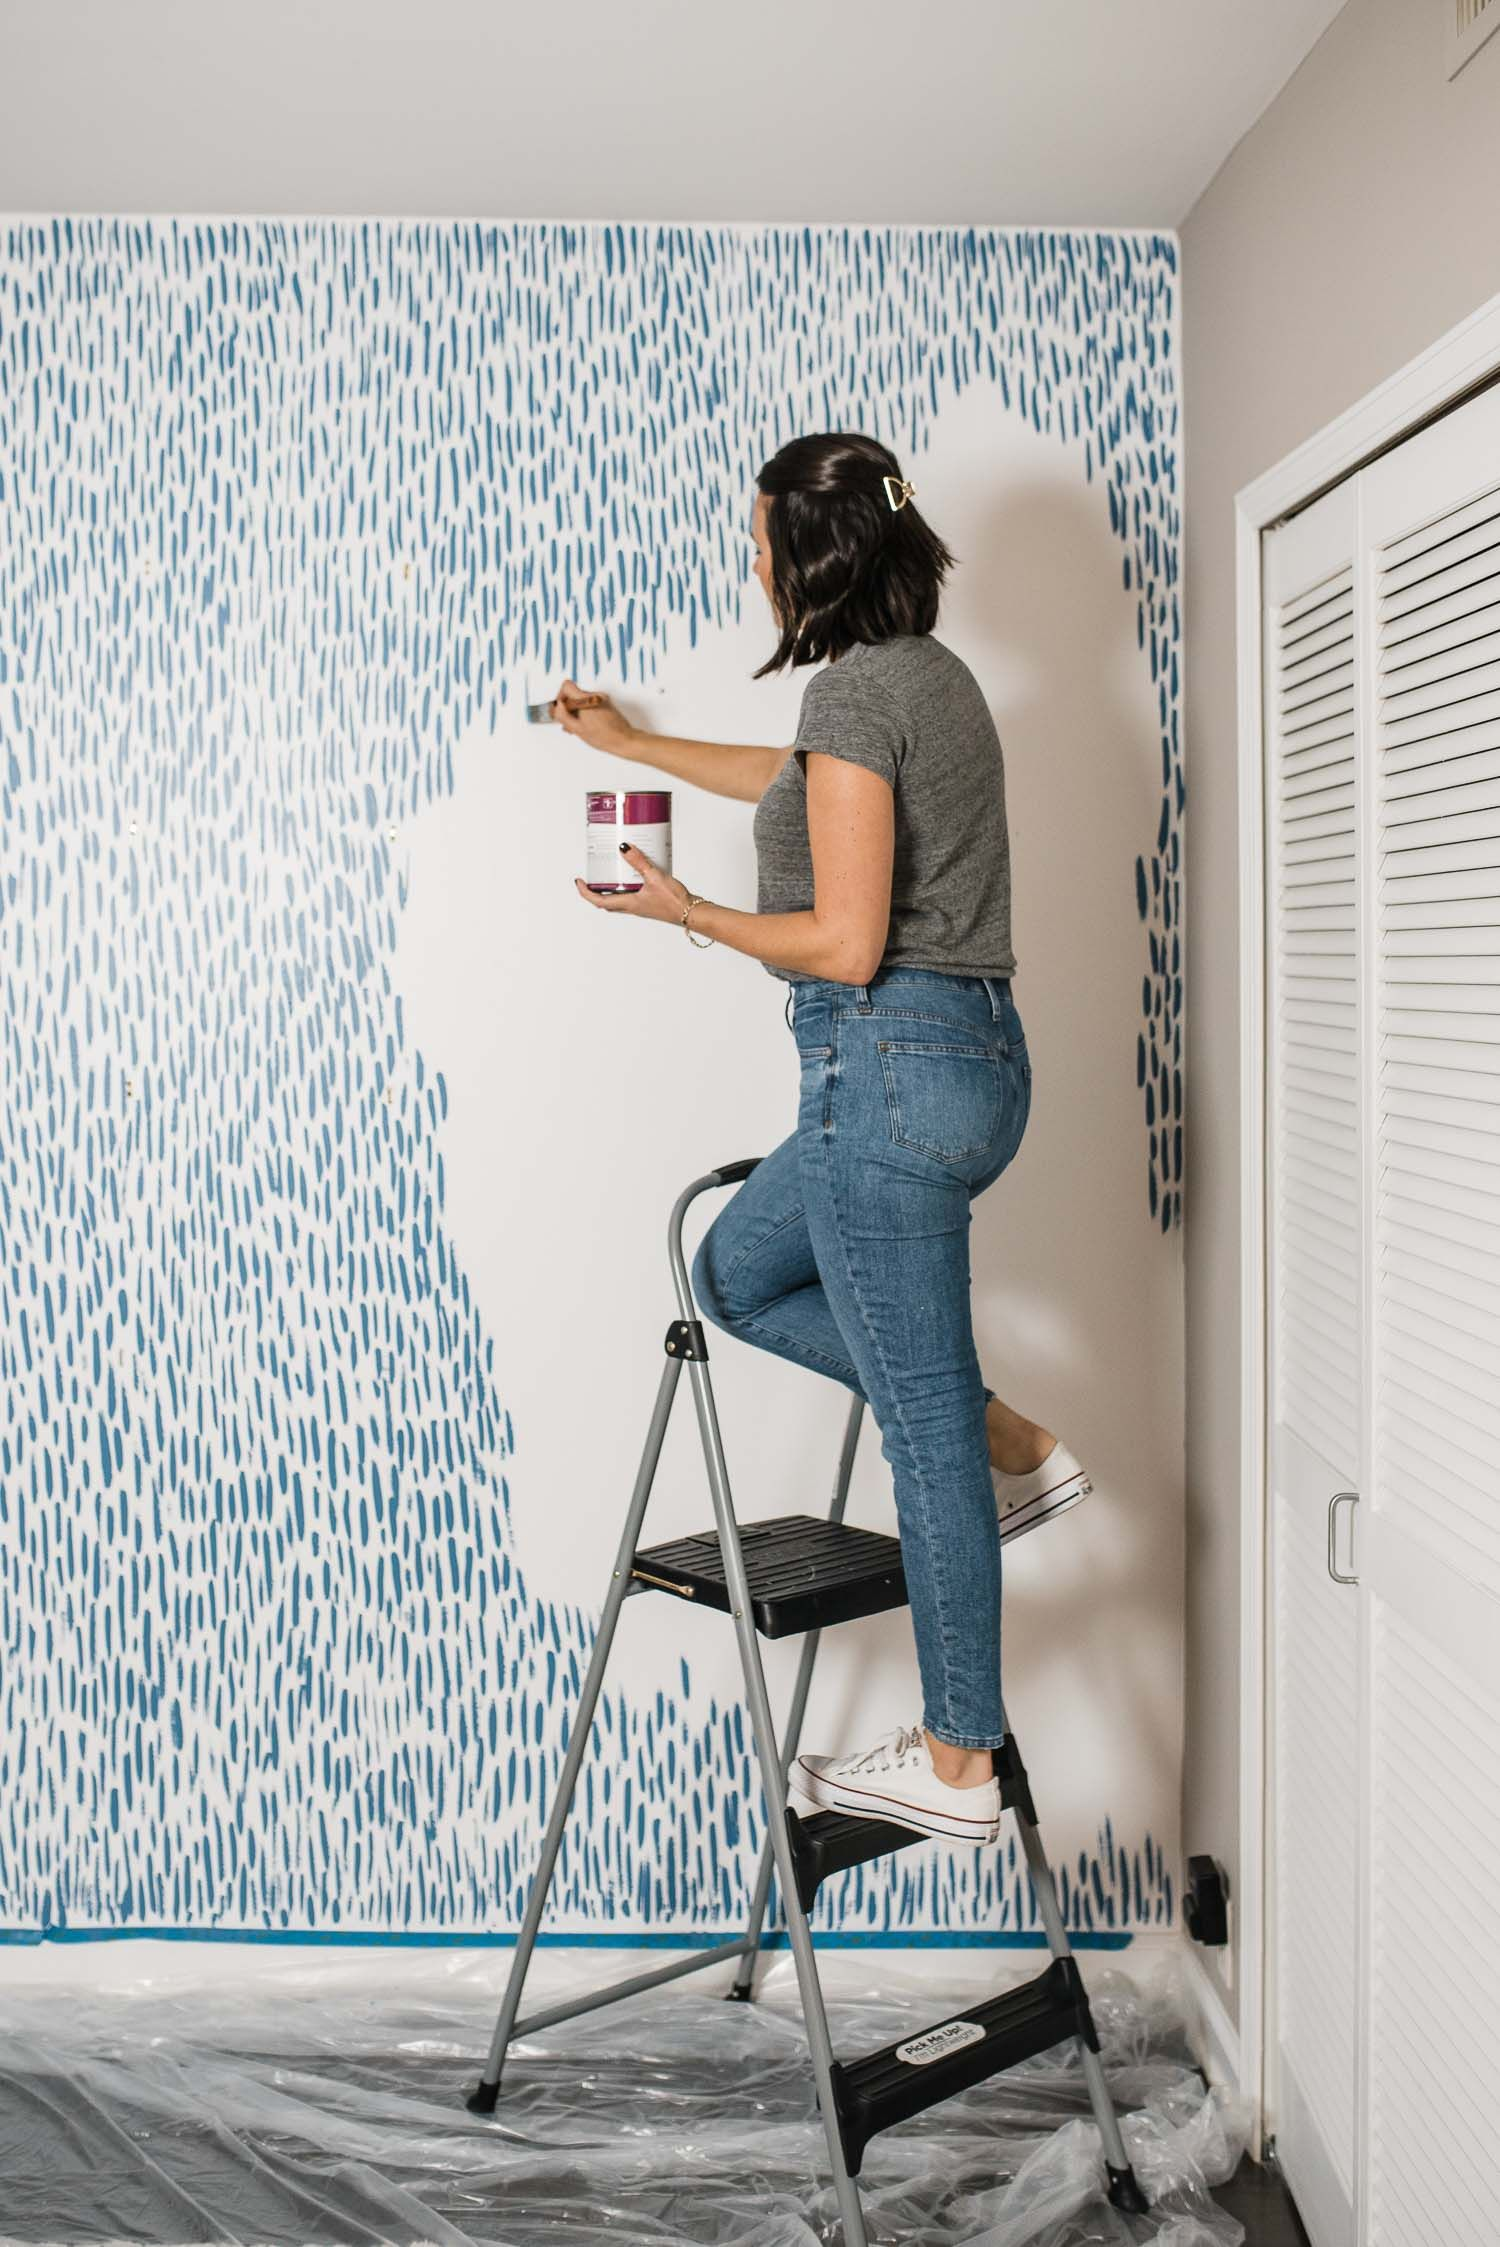 Diy Brushstroke Accent Wall Tutorial My Style Vita In 2020